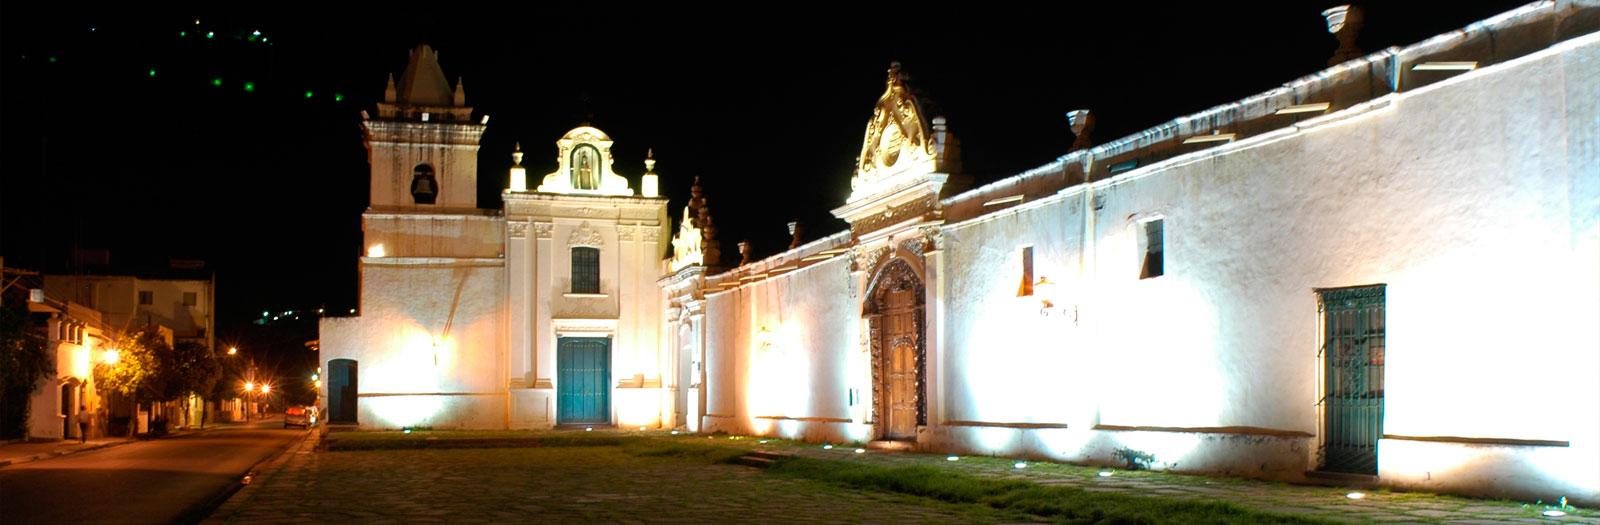 Convento San Bernardo, Salta. Por Eliseo Miciu (gentileza de turismo.salta.gov.ar)